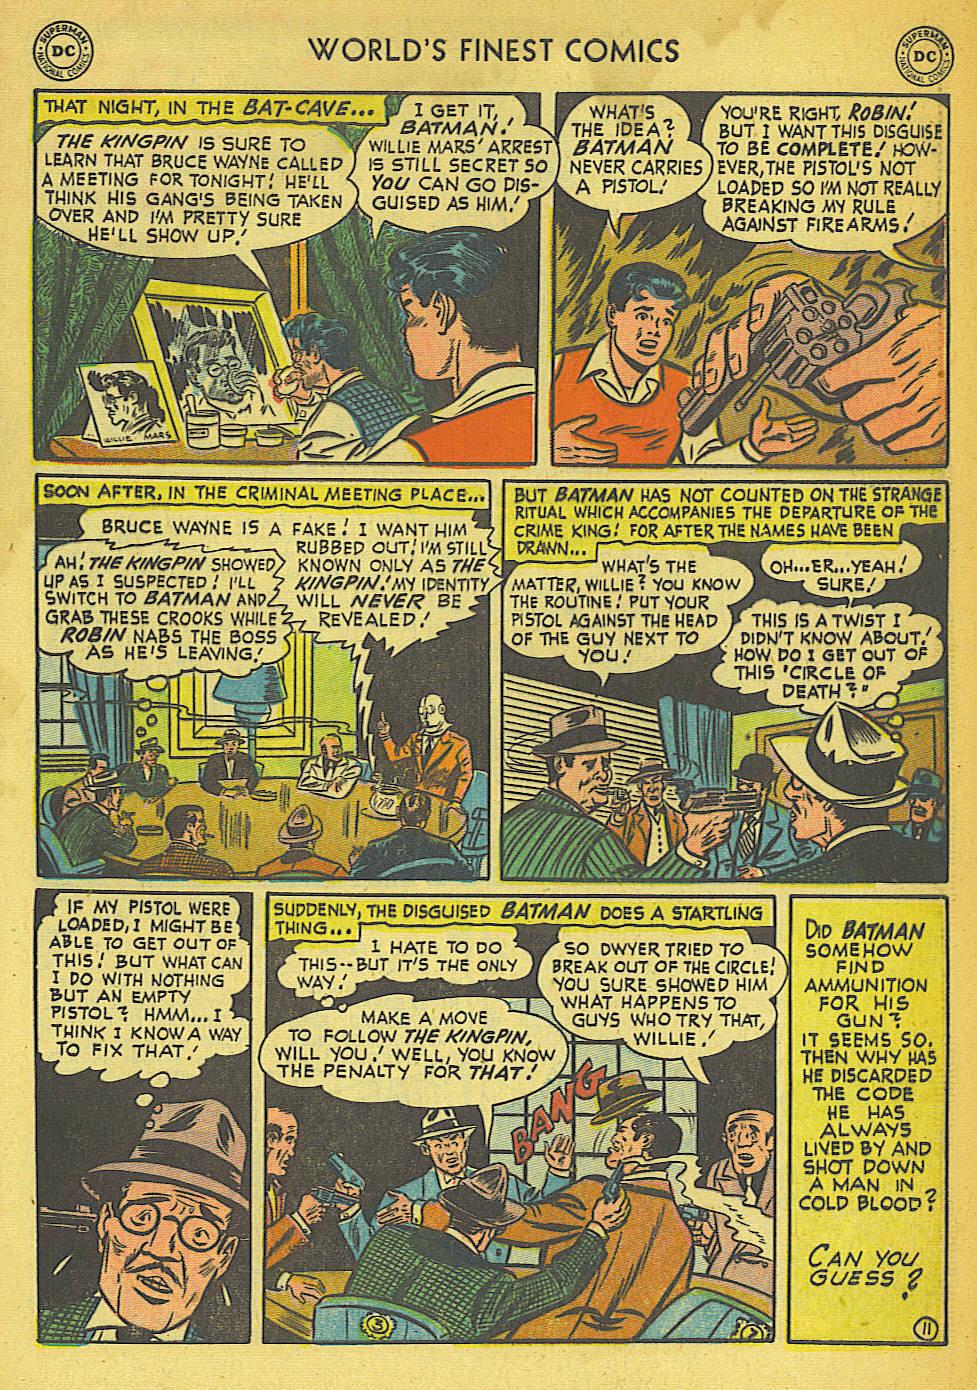 Read online World's Finest Comics comic -  Issue #57 - 63